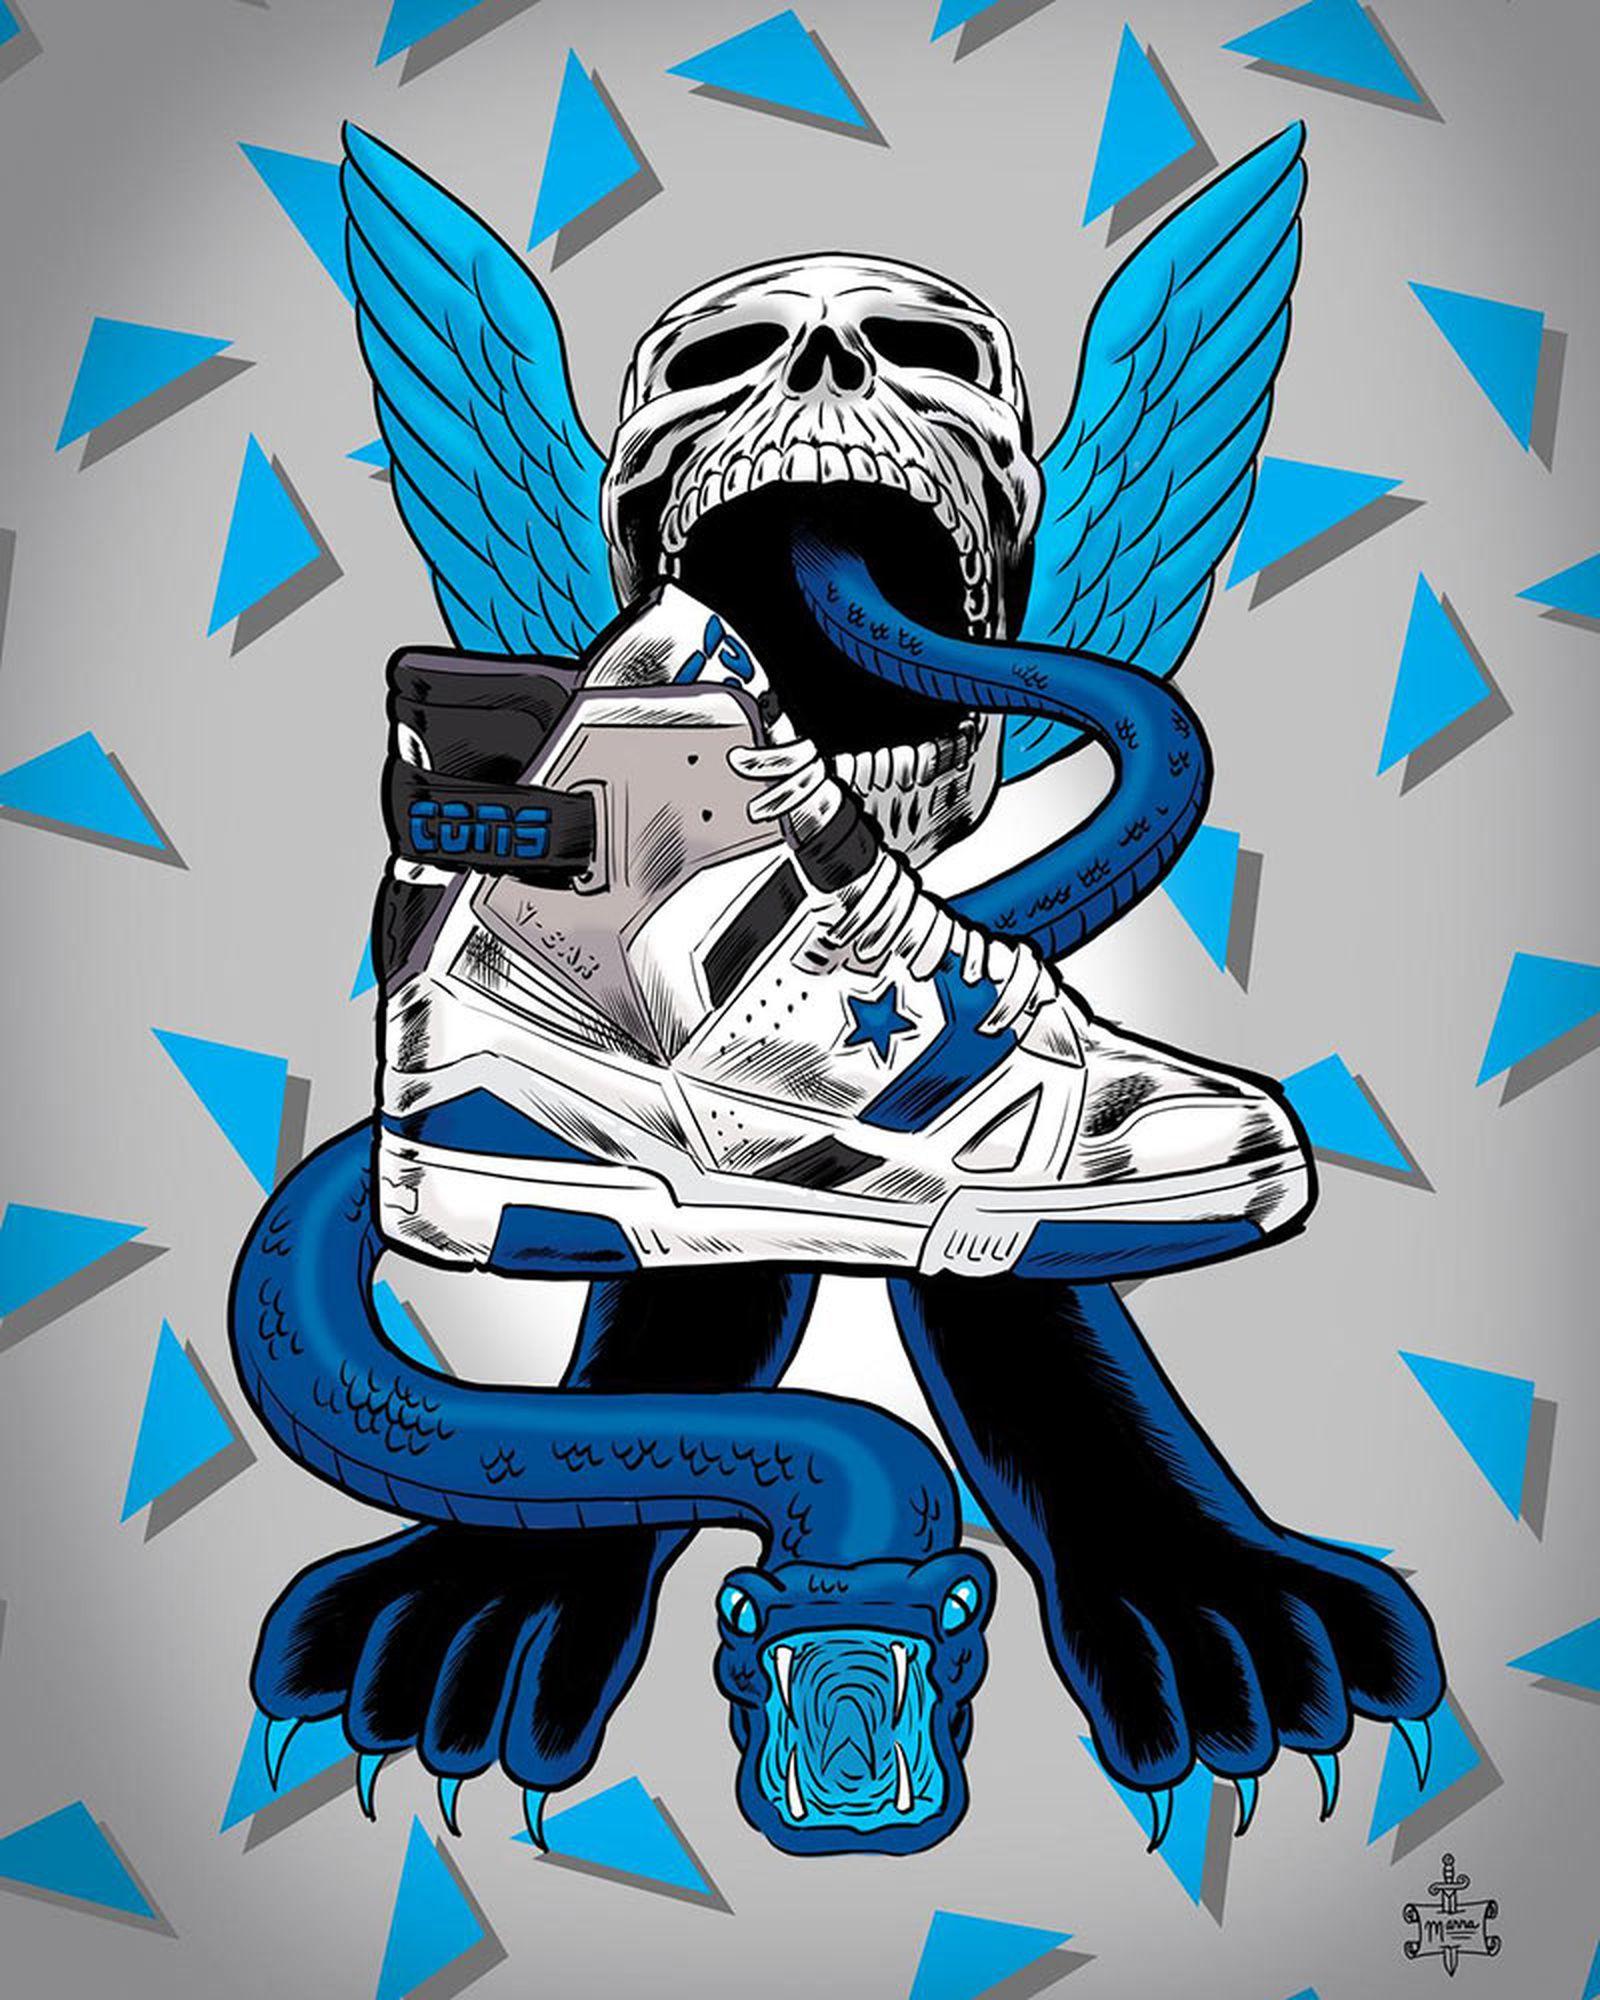 converse taps don c relaunch erx sneaker just don